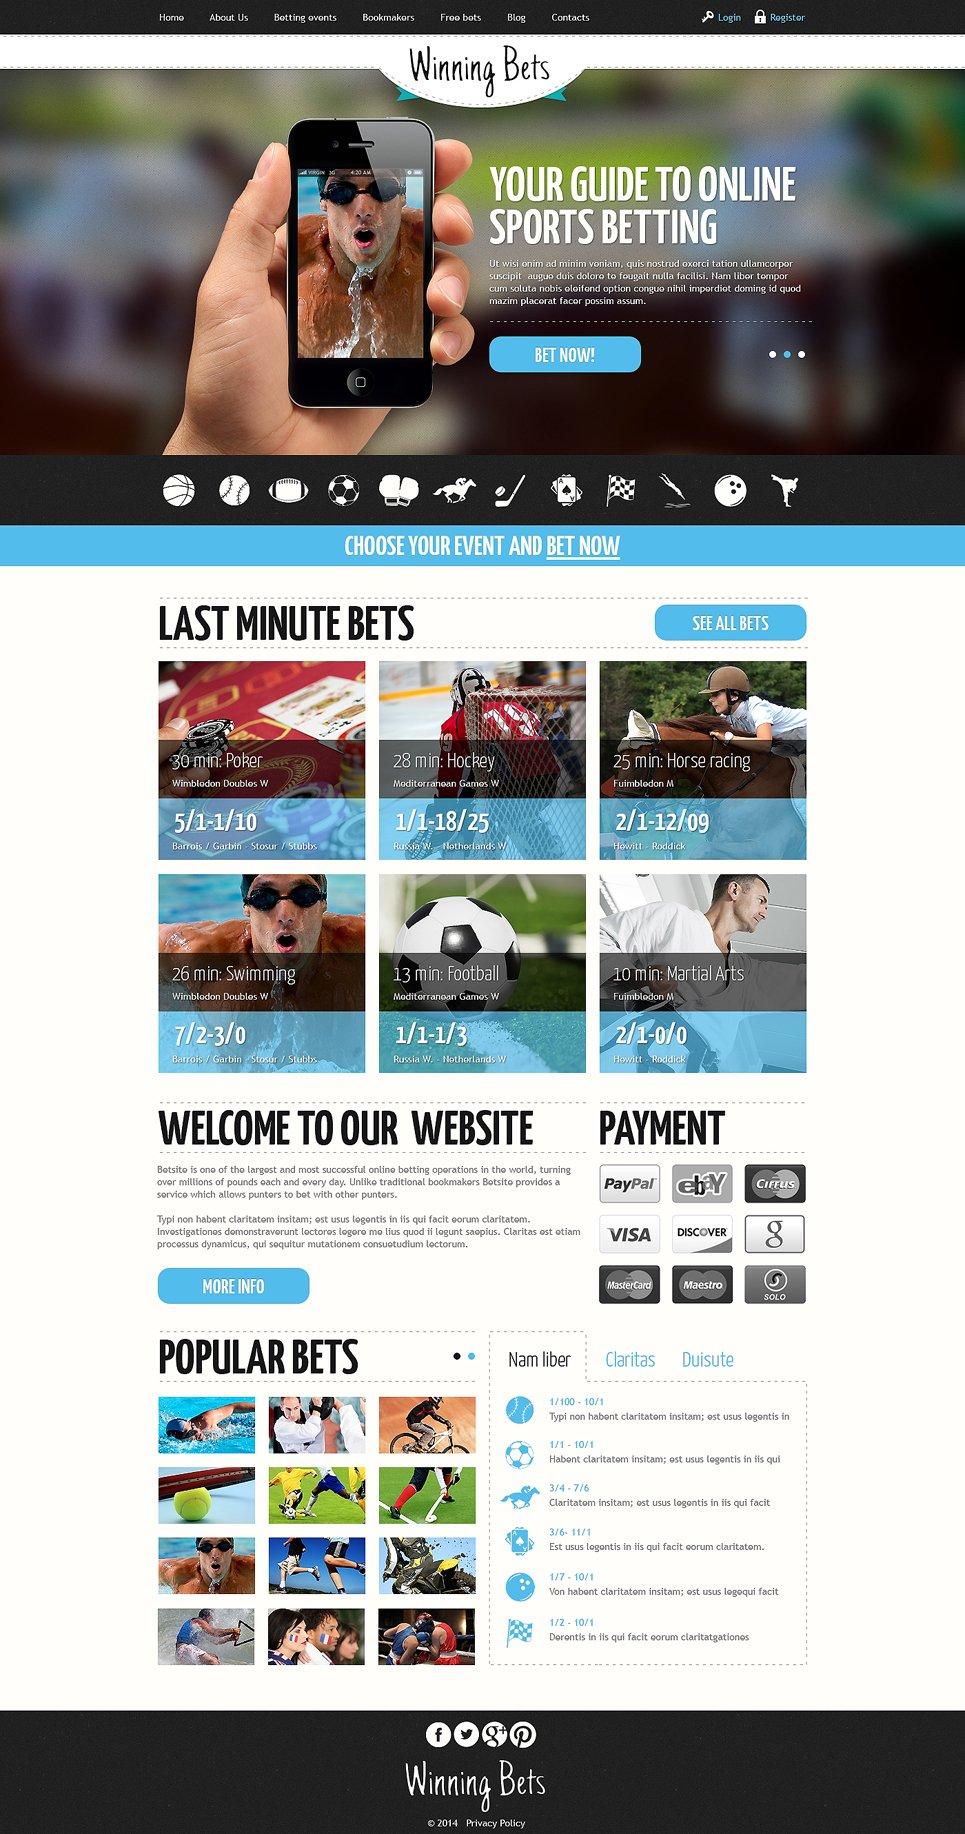 Starting an online casino in australia